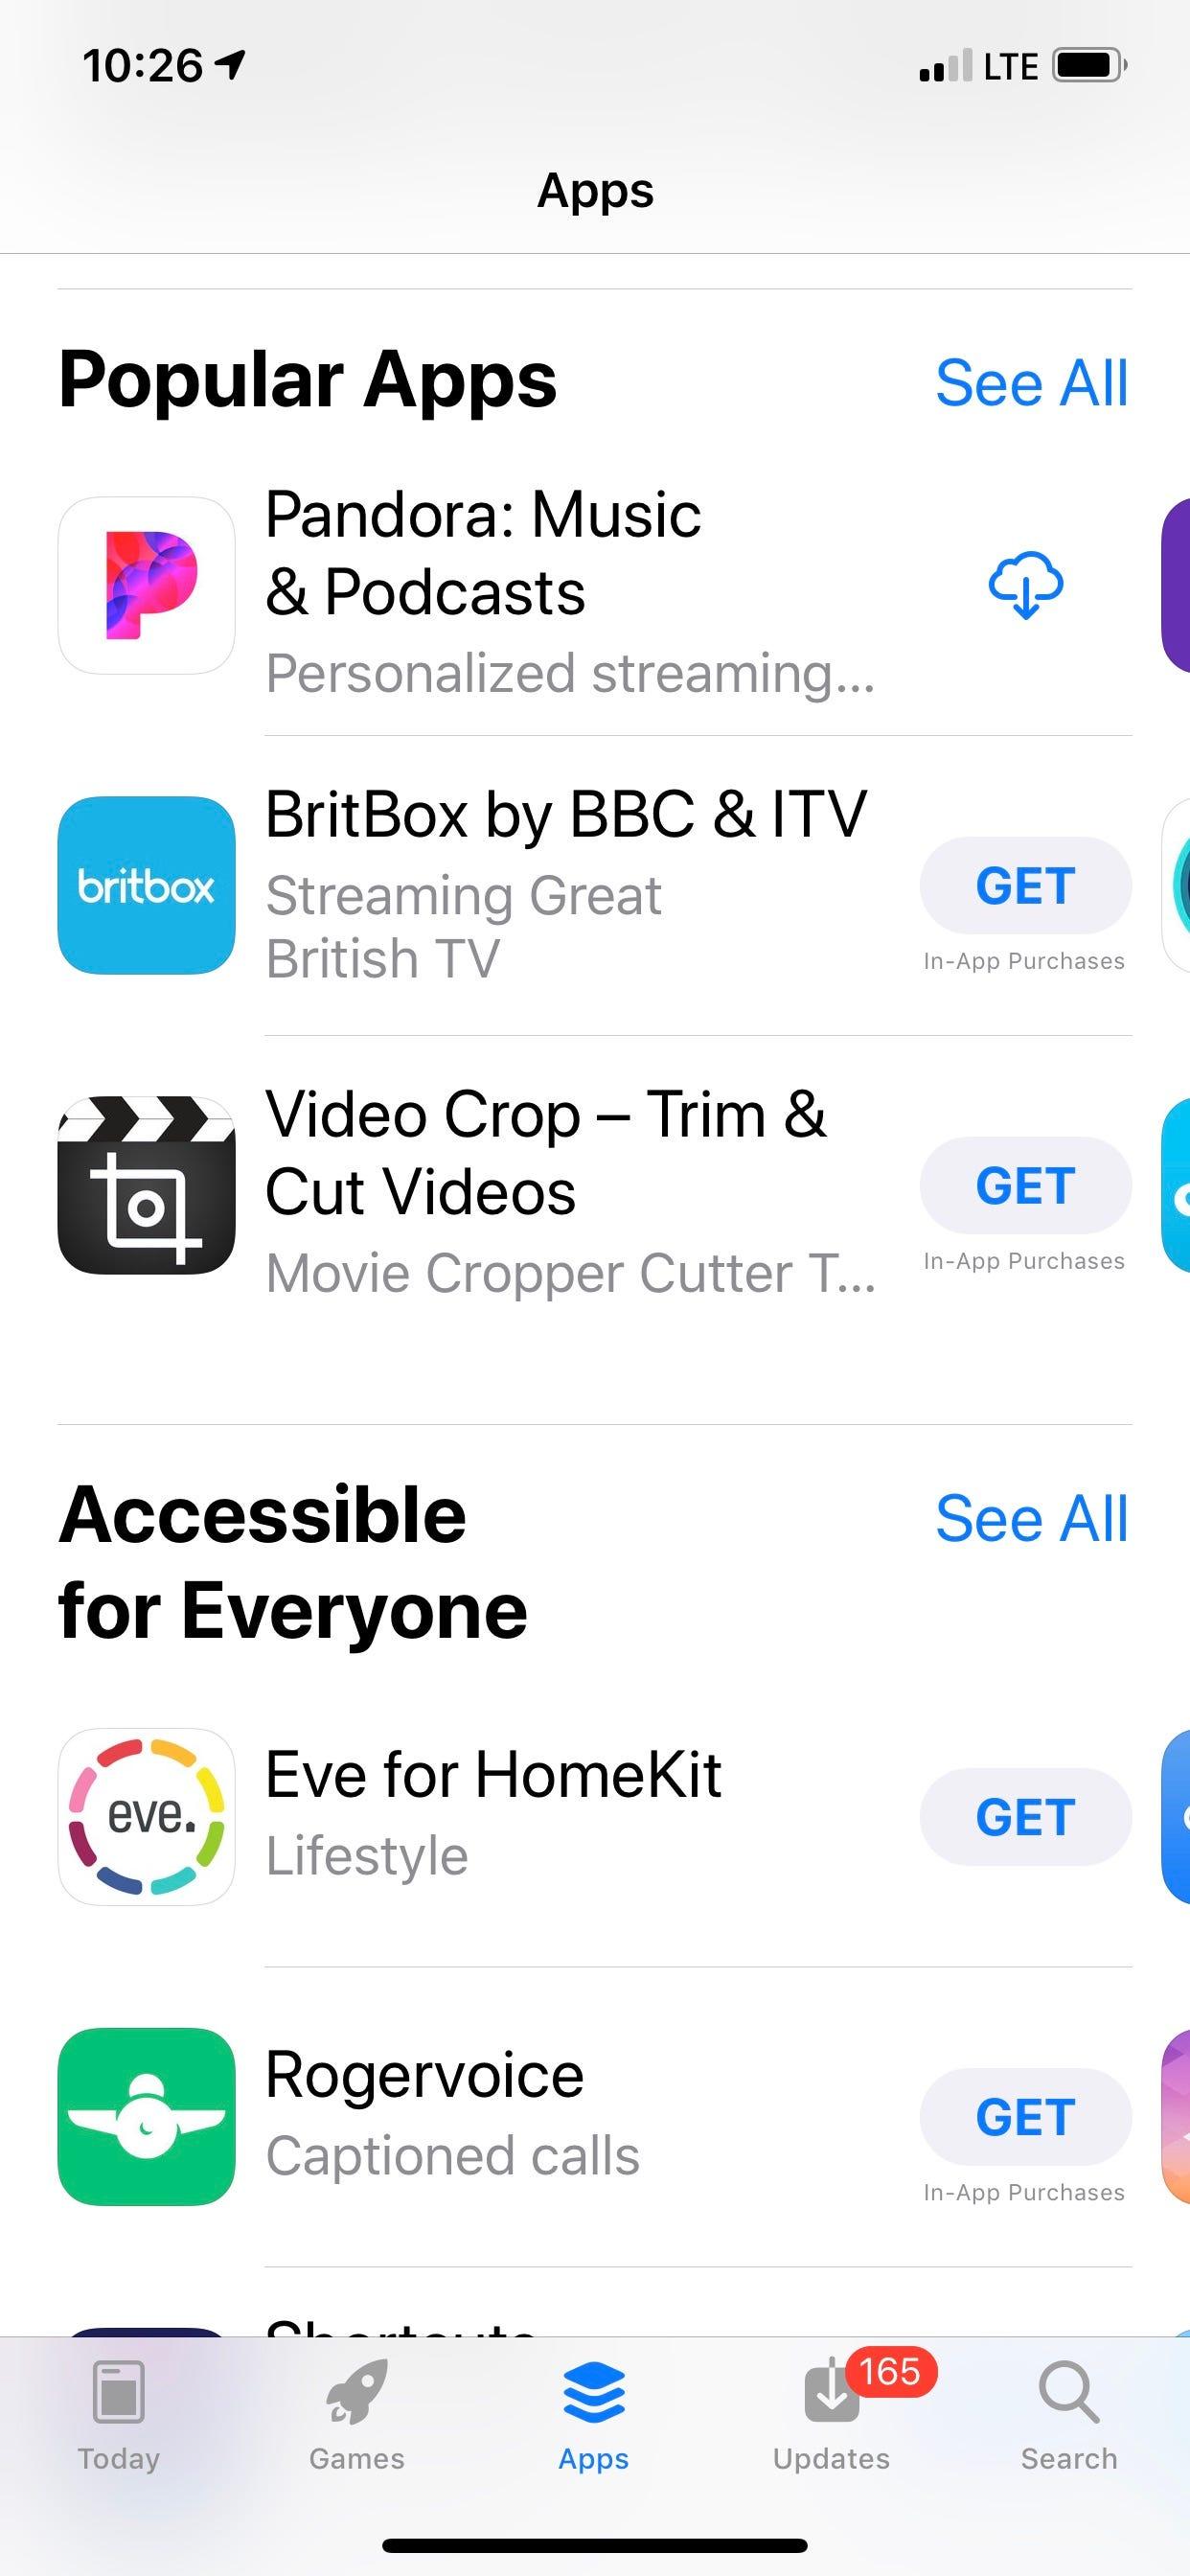 Imagine Apple's App Store with no walled garden